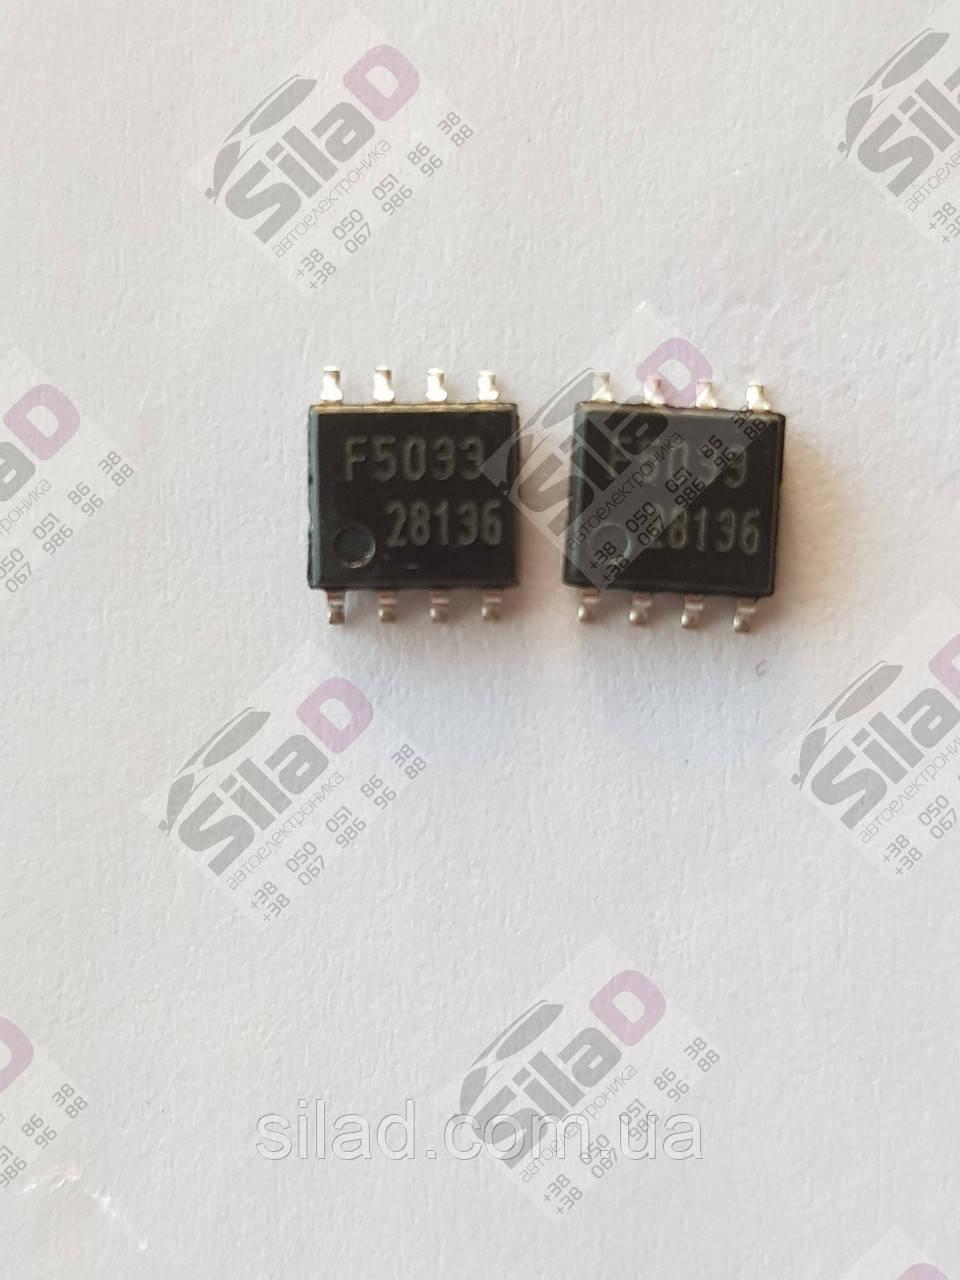 Мікросхема F5033 Fuji Electric корпус SOP8